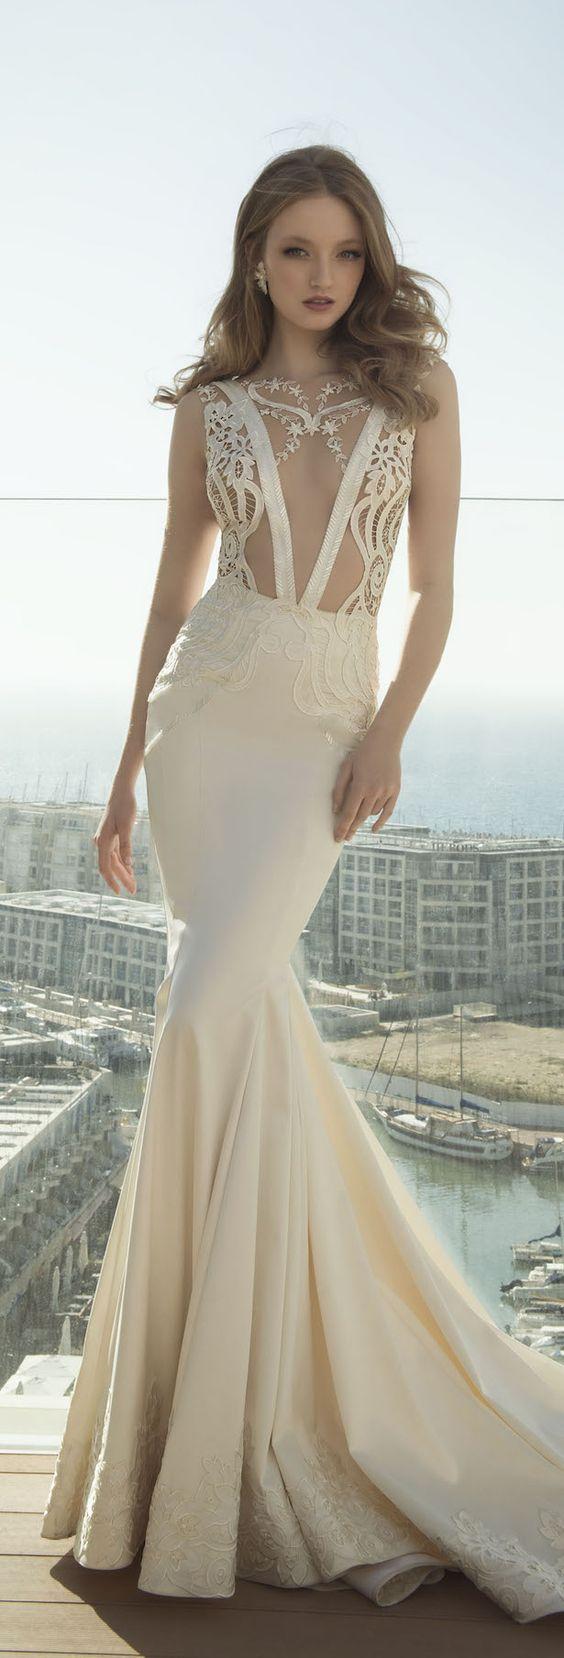 deep plunging v neck wedding dresses plunge wedding dress Designer Dany Mizrachi Dany Mizrachi V Neck Mermaid Wedding Dress